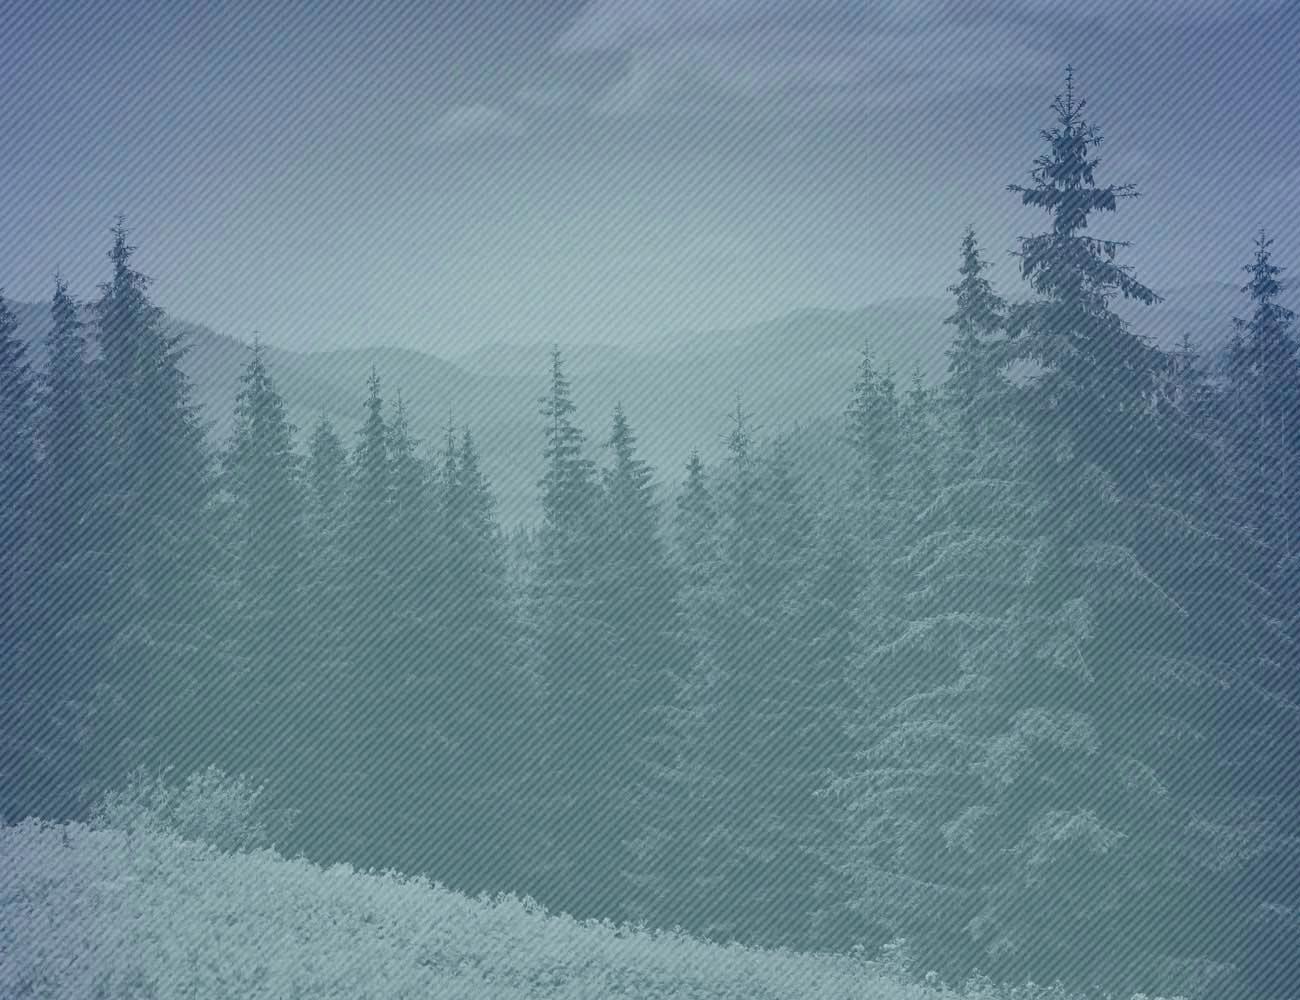 jamboree-background